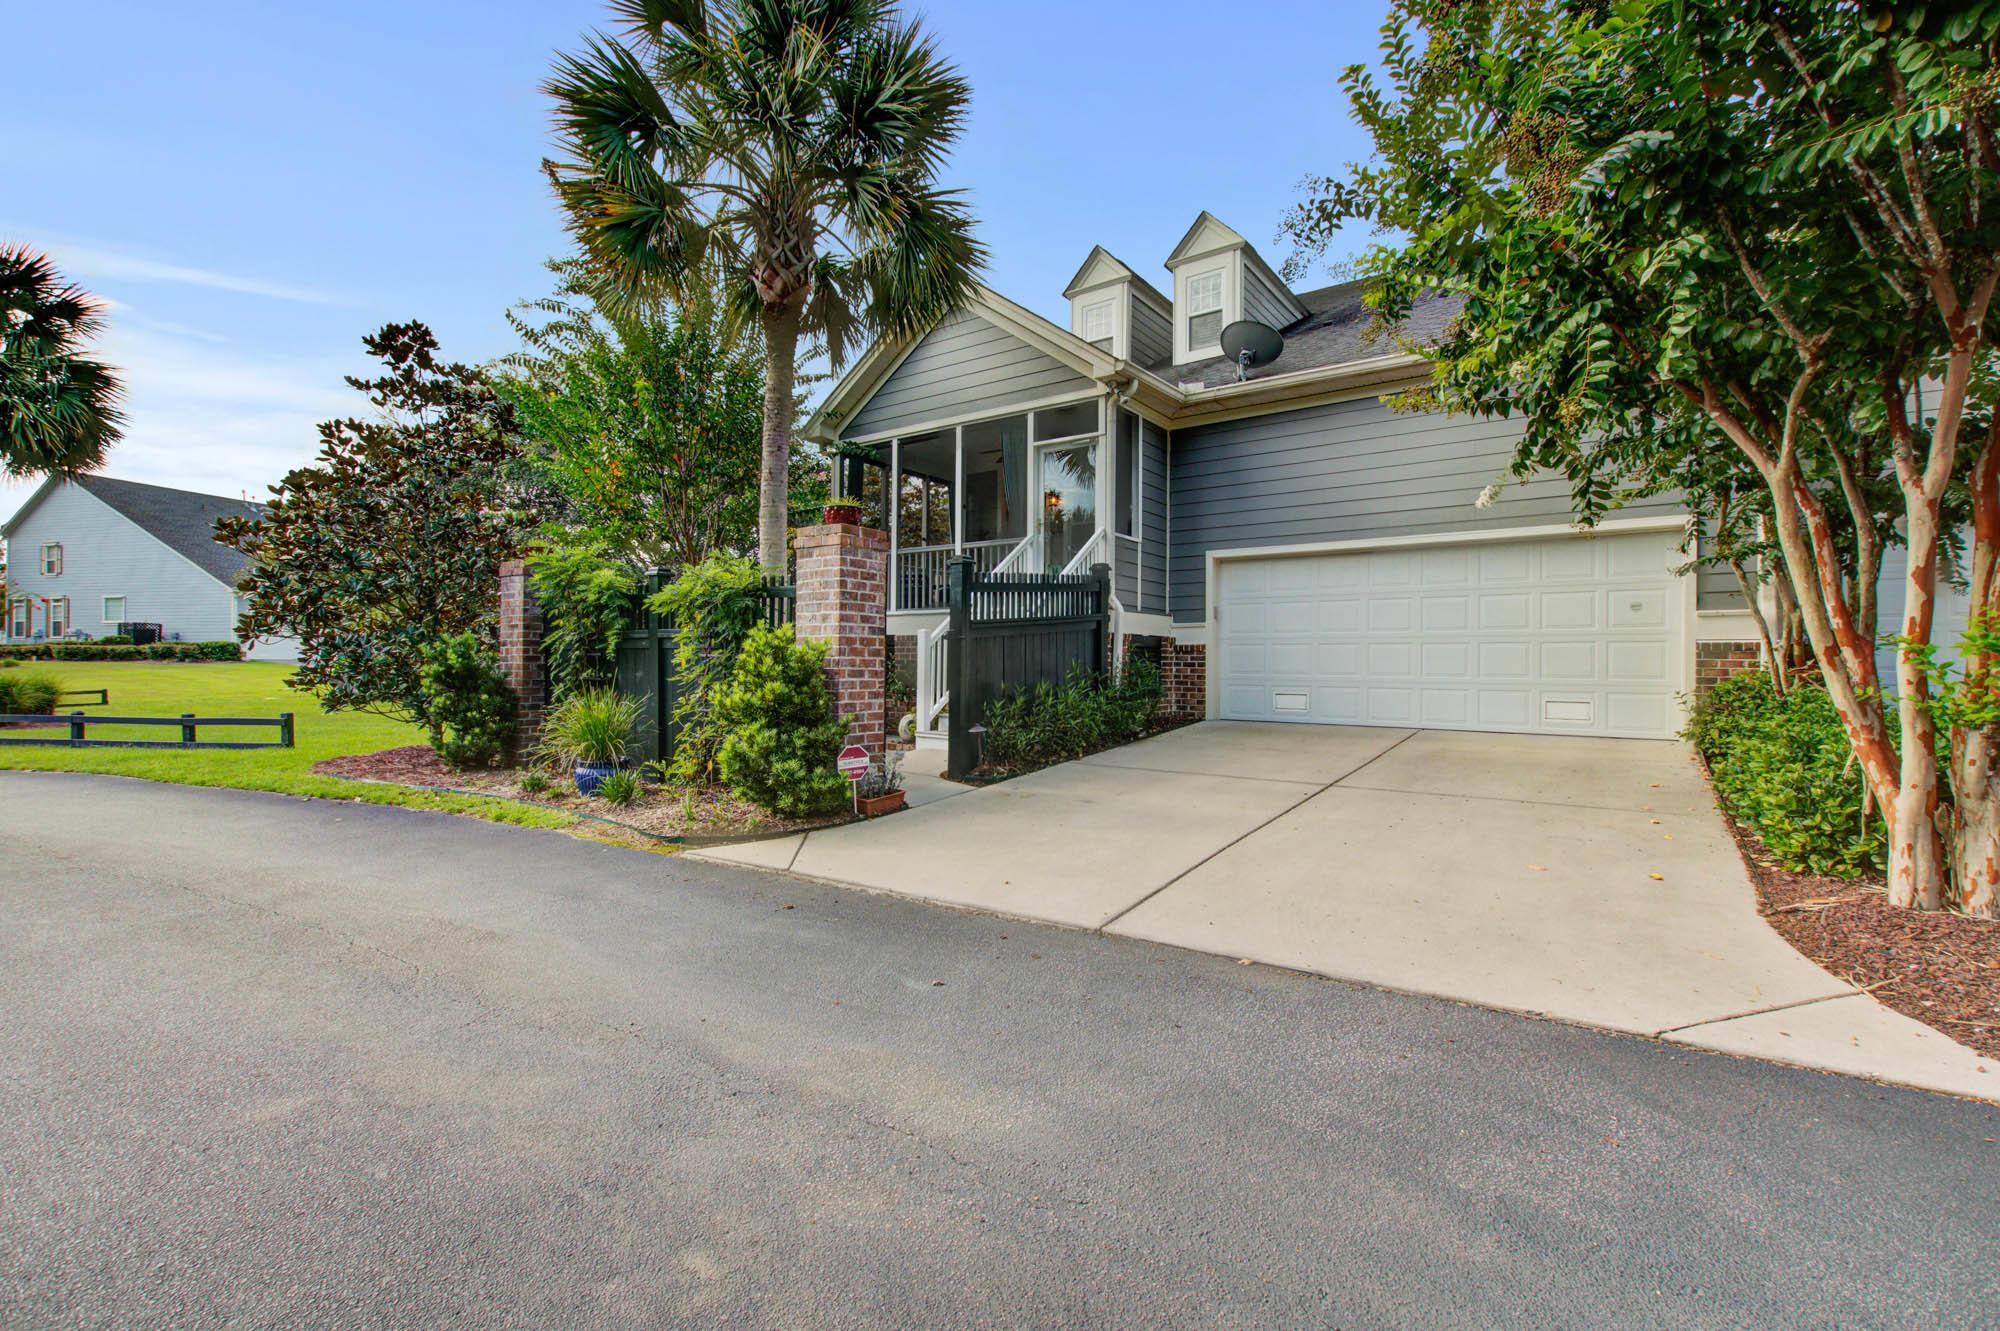 Hamlin Plantation Homes For Sale - 2840 Treadwell, Mount Pleasant, SC - 13